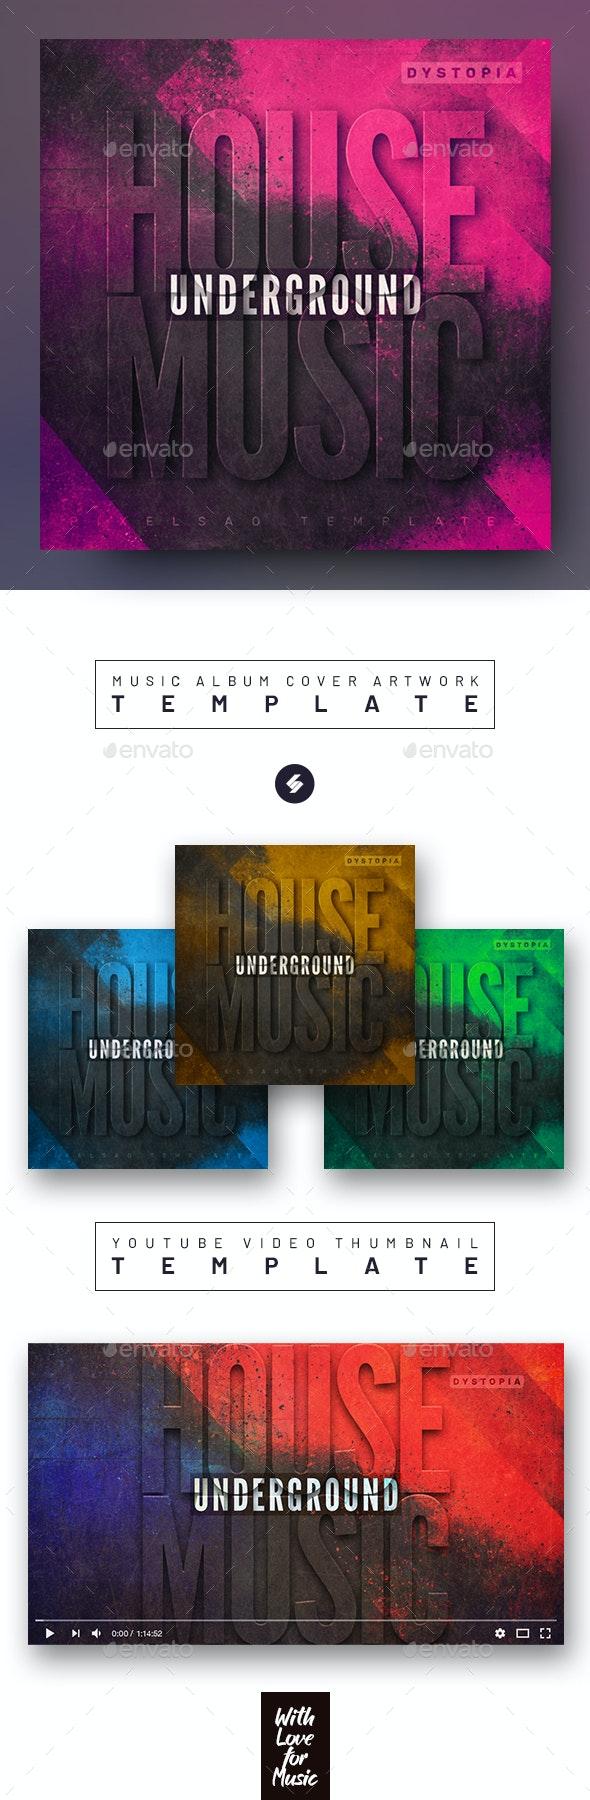 Underground Music Album Cover Artwork Template - Miscellaneous Social Media